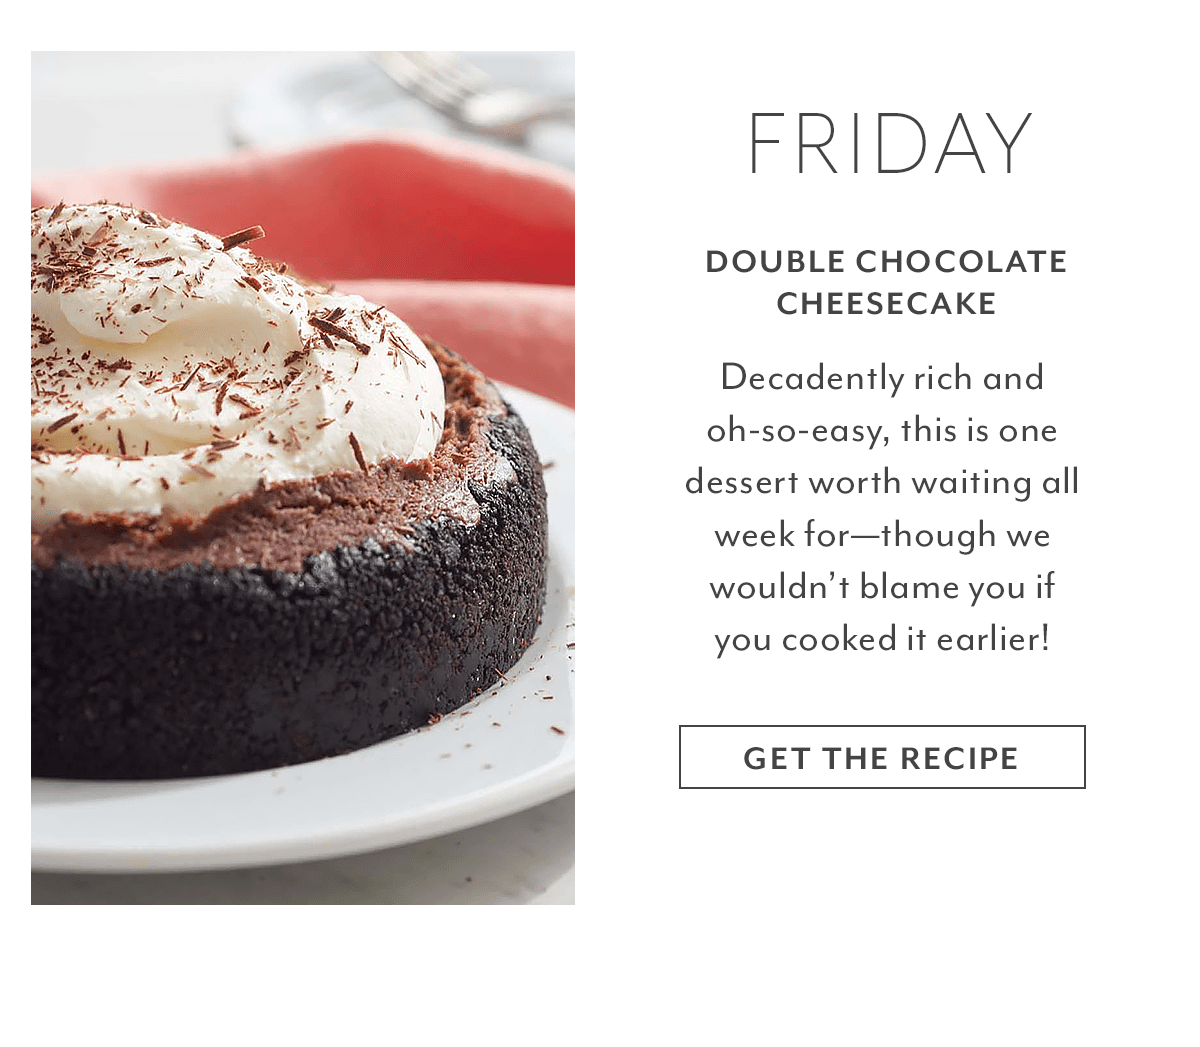 Recipe - Double Chocolate Cheesecake